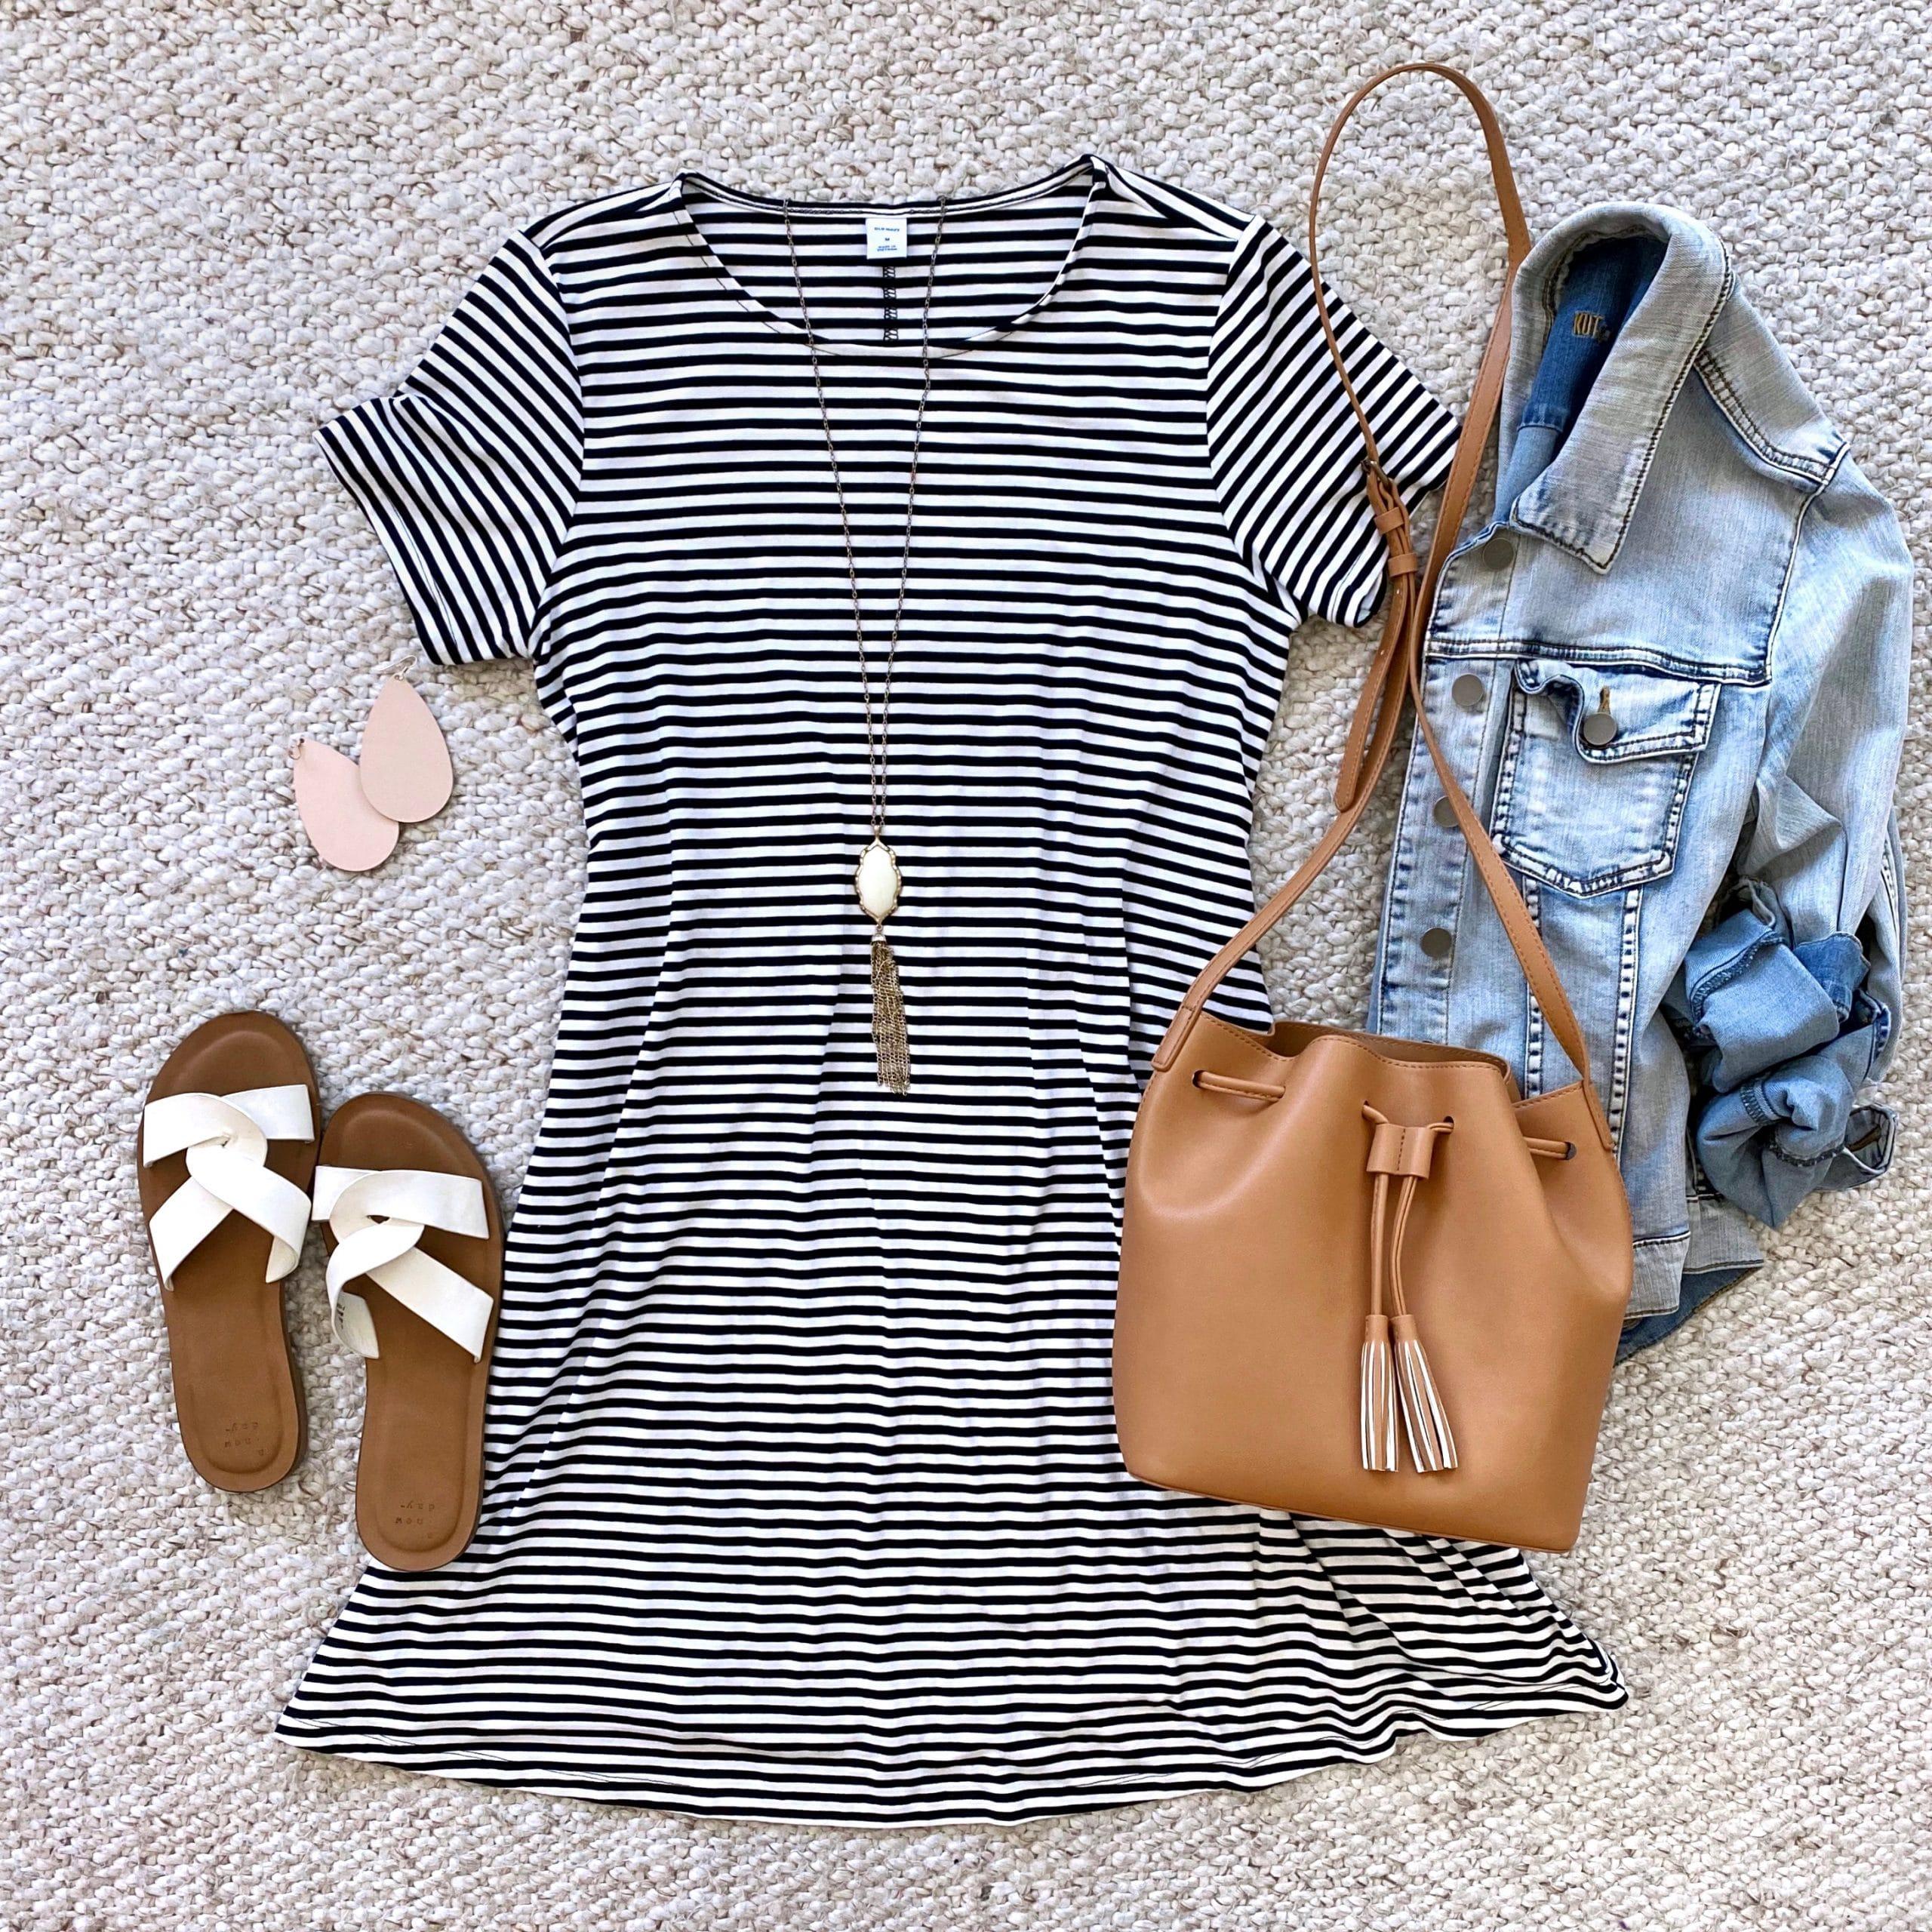 Casual Spring Outfit: striped swing dress + denim jacket + white slide sandals + tan drawstring crossbody bag + long gold fringe pendant necklace + blush leather earrings